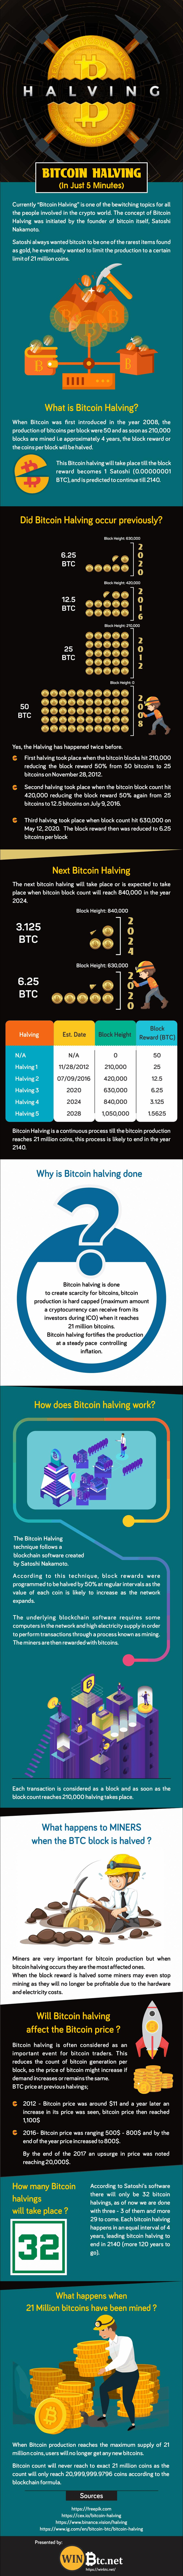 Bitcoin Halving infographic